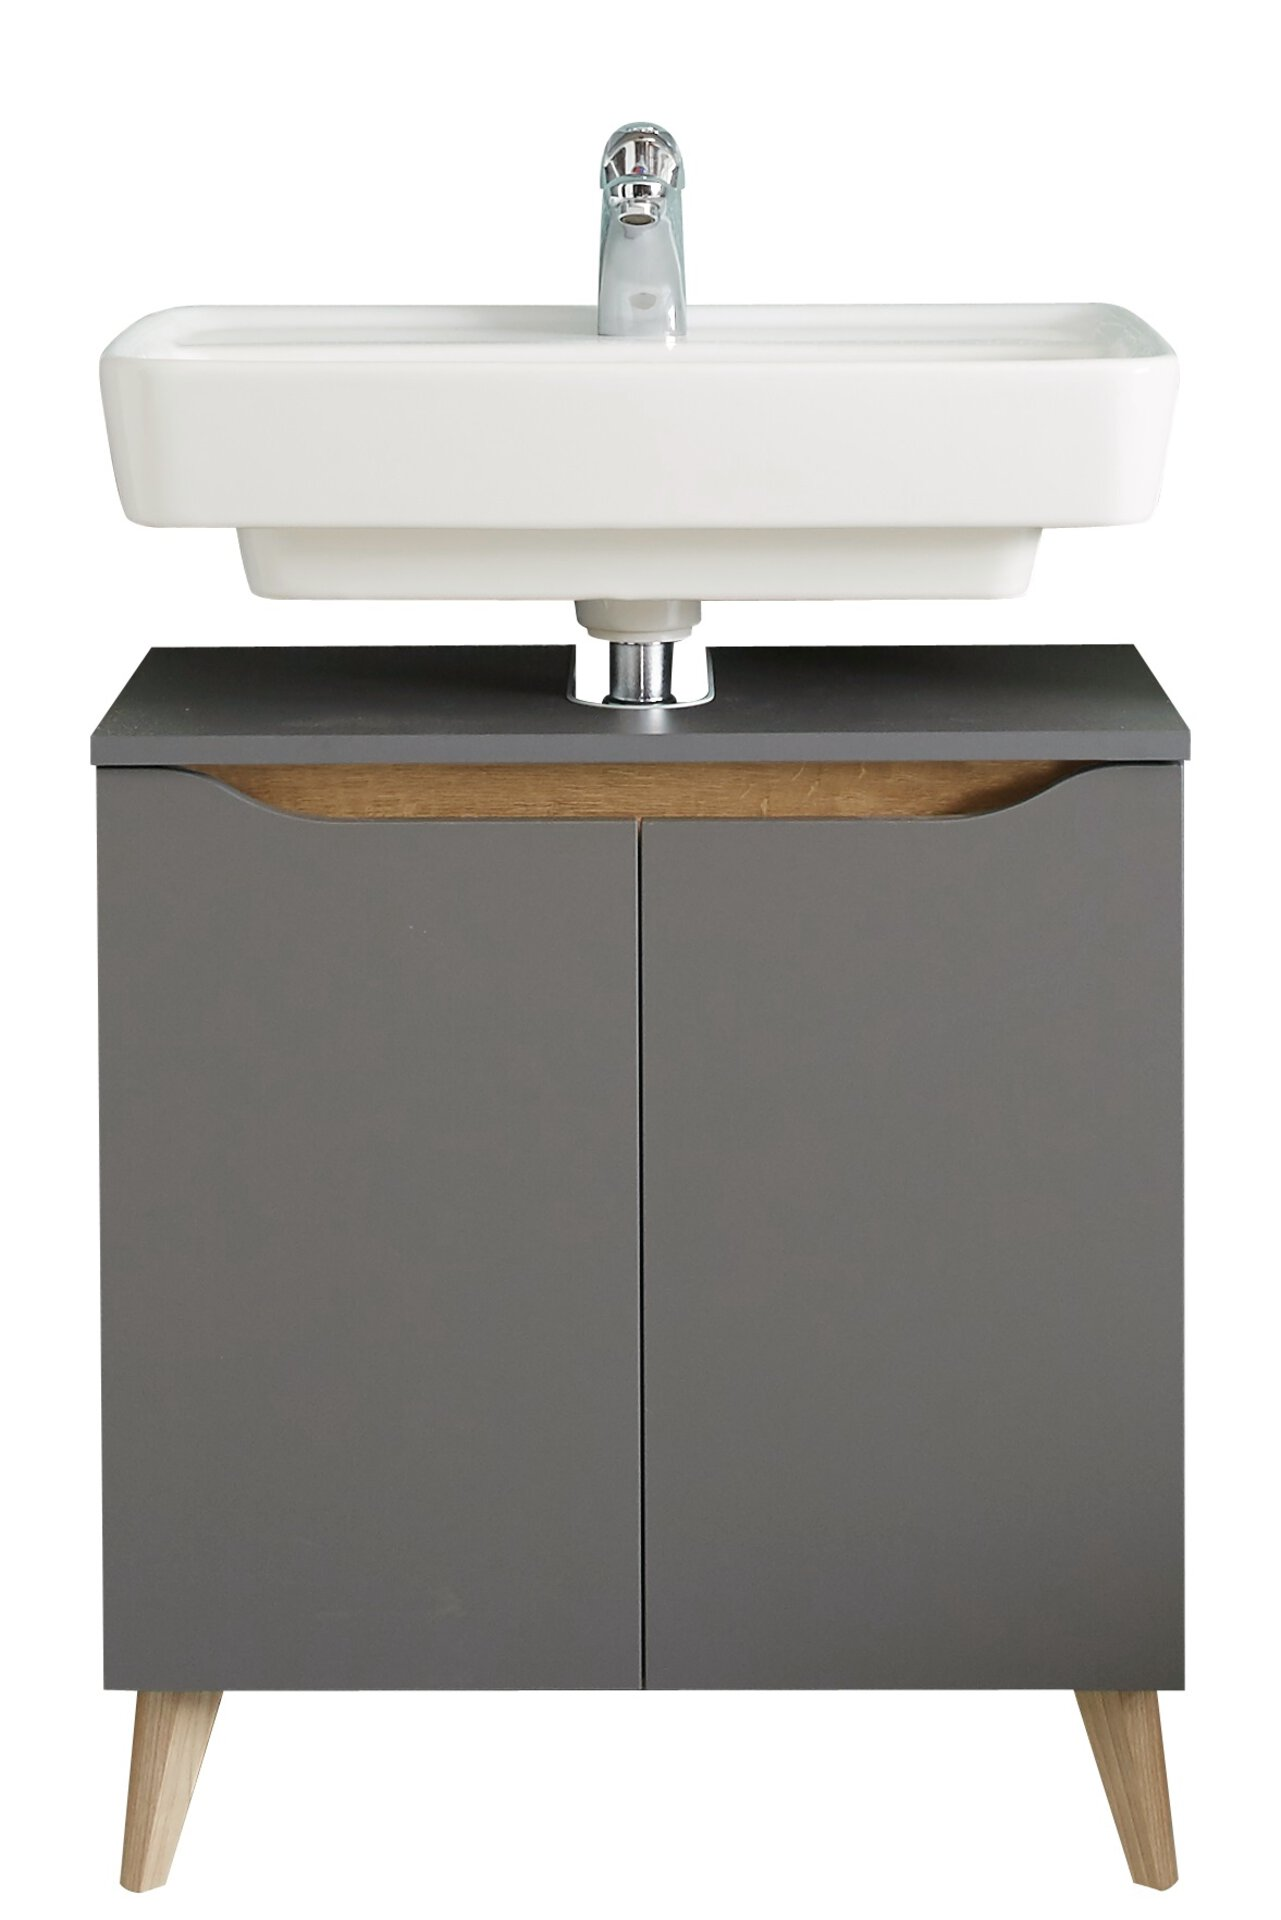 Waschbeckenunterschrank Capri PELIPAL Holzwerkstoff grau